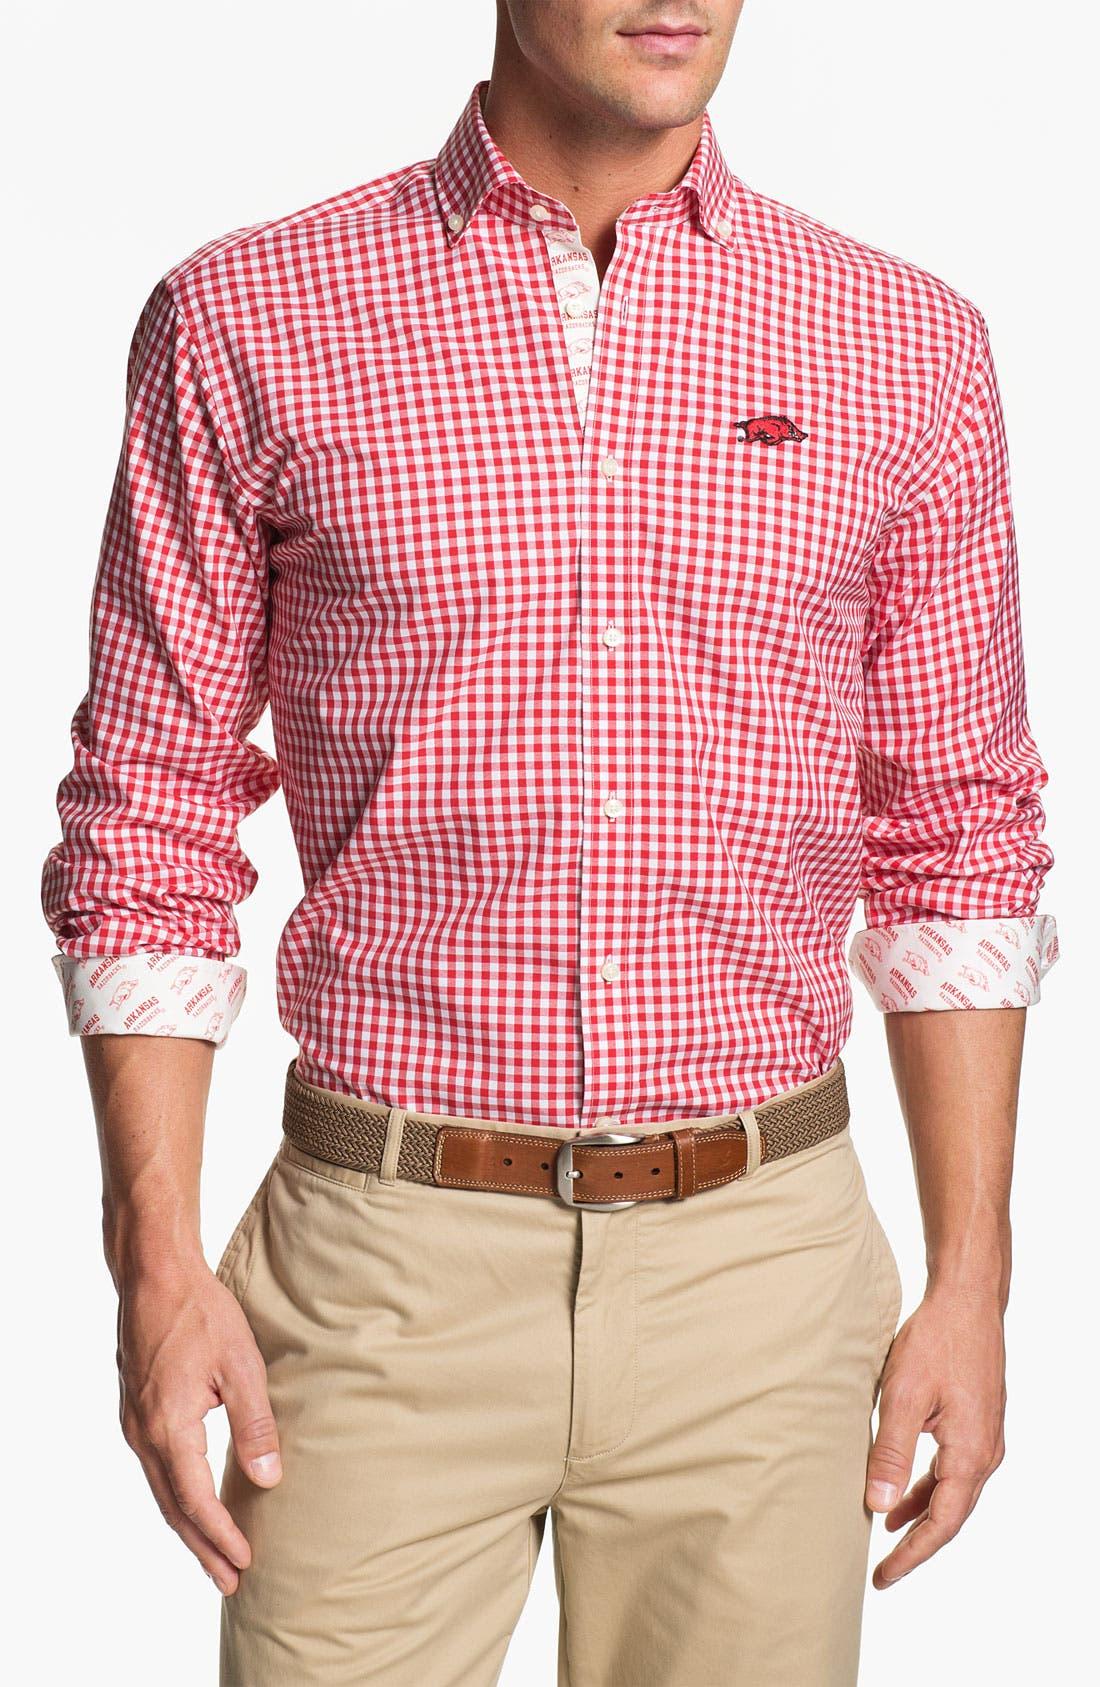 Alternate Image 1 Selected - Thomas Dean 'University of Arkansas' Regular Fit Gingham Sport Shirt